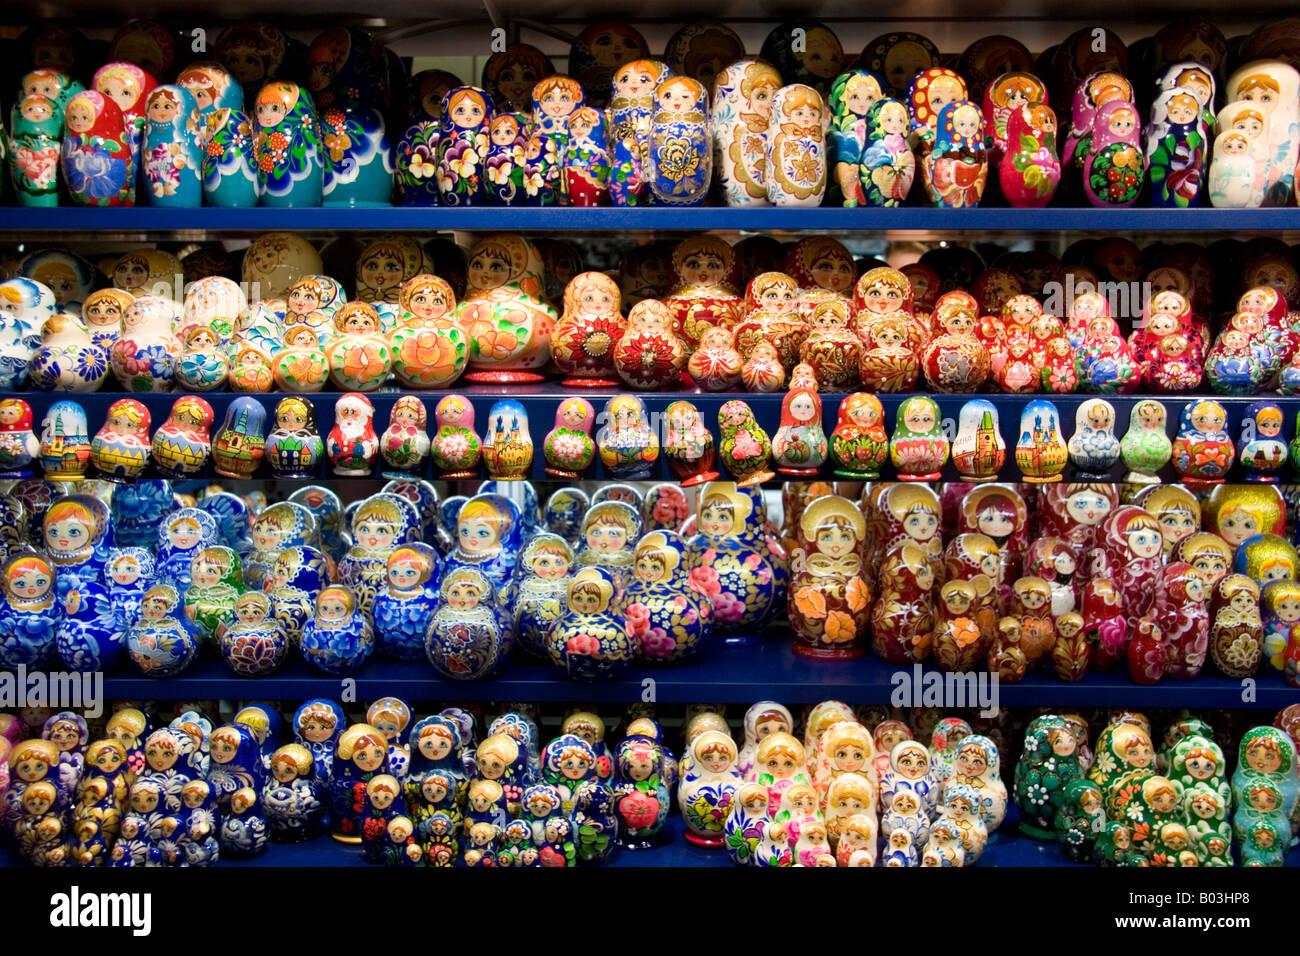 Stock Photo Matryoshka Dolls Prague Czech Republic 17290176 additionally Story additionally Foto Quando Il Tradimento together with Watch further Benvenuto Tullio. on sto live